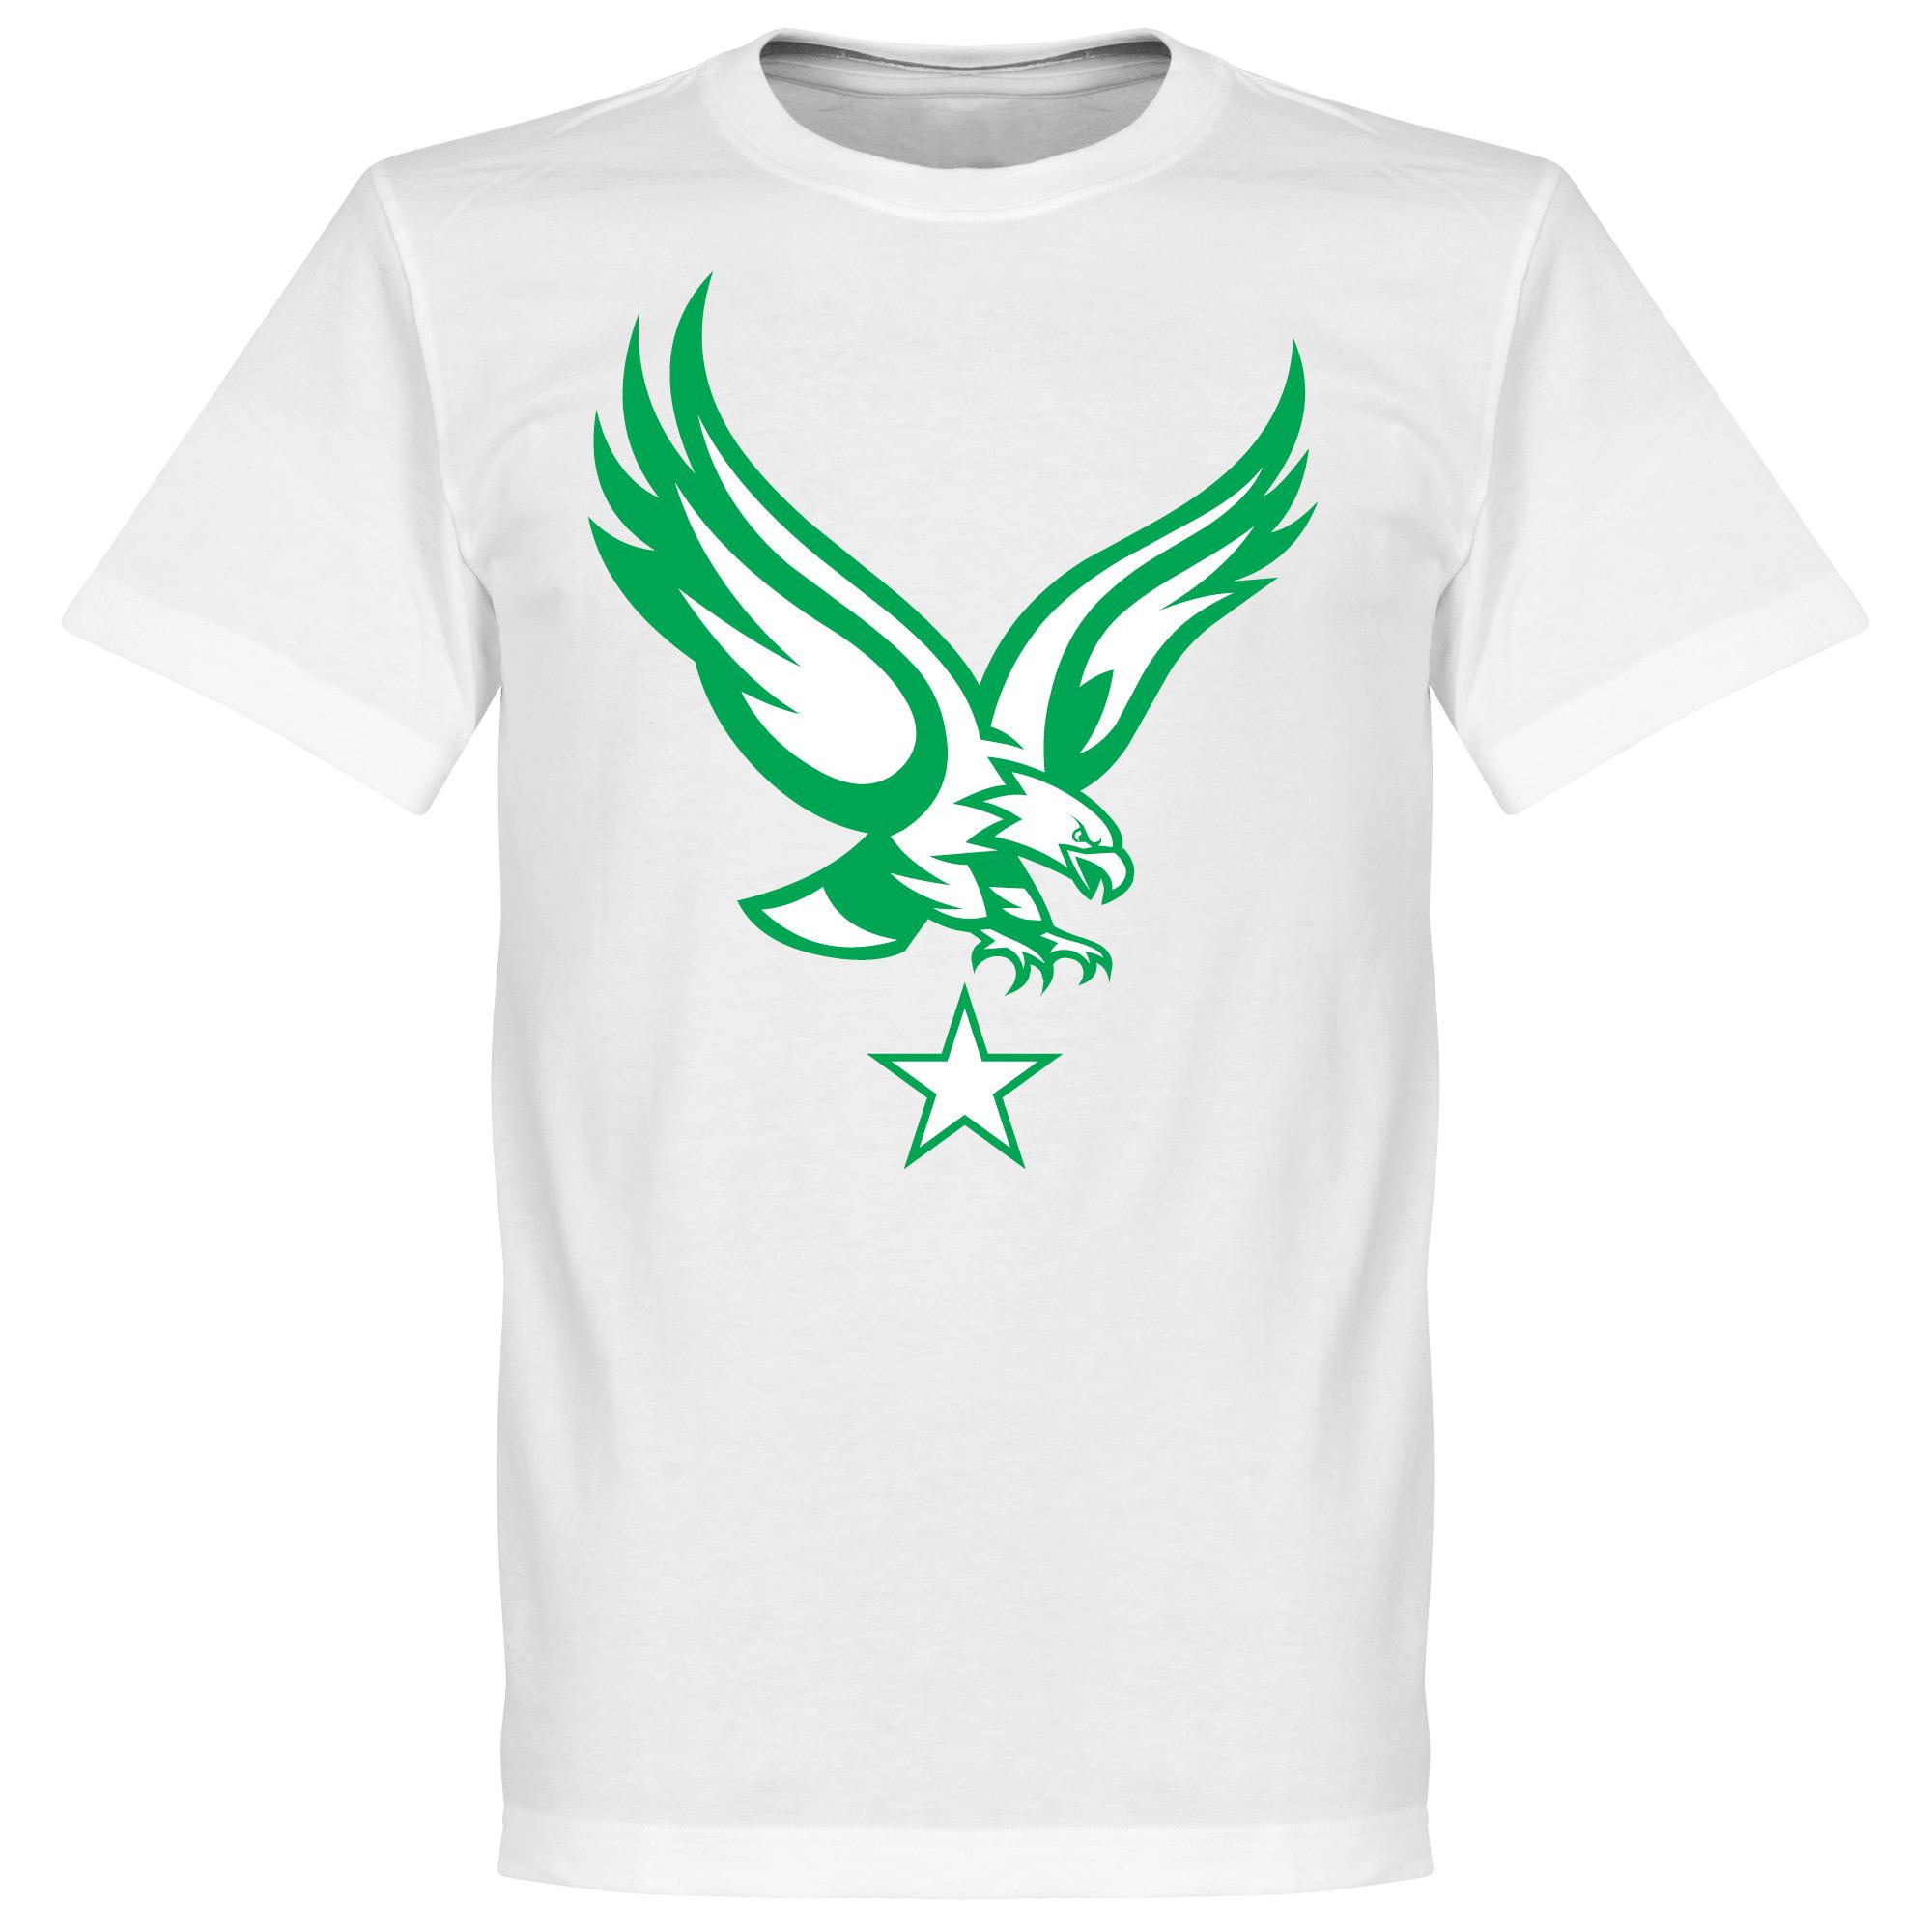 Togo Eagle Tee - White - L